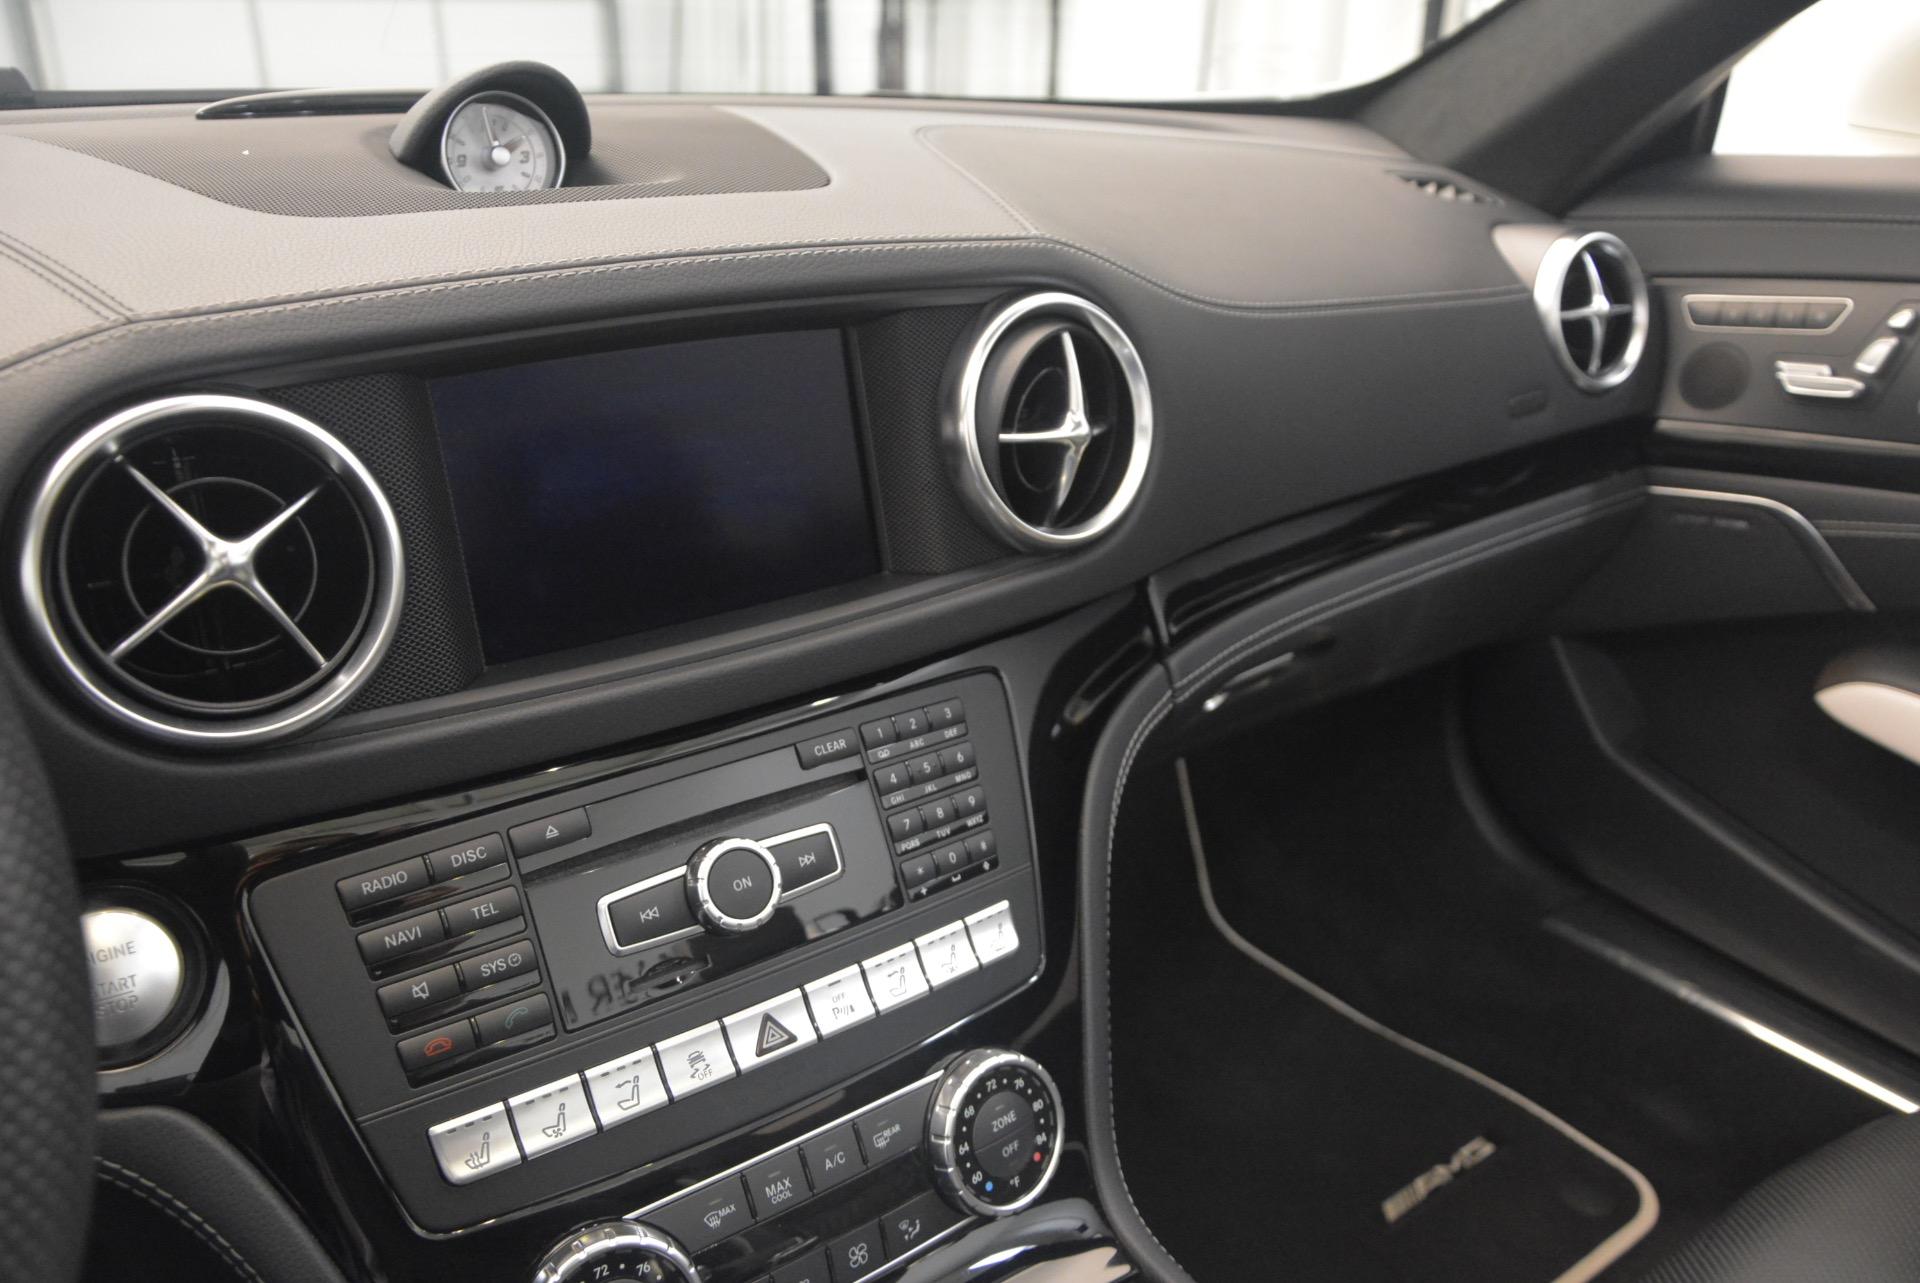 Used 2015 Mercedes Benz SL-Class SL 550 For Sale In Greenwich, CT. Alfa Romeo of Greenwich, M1874A 1261_p34